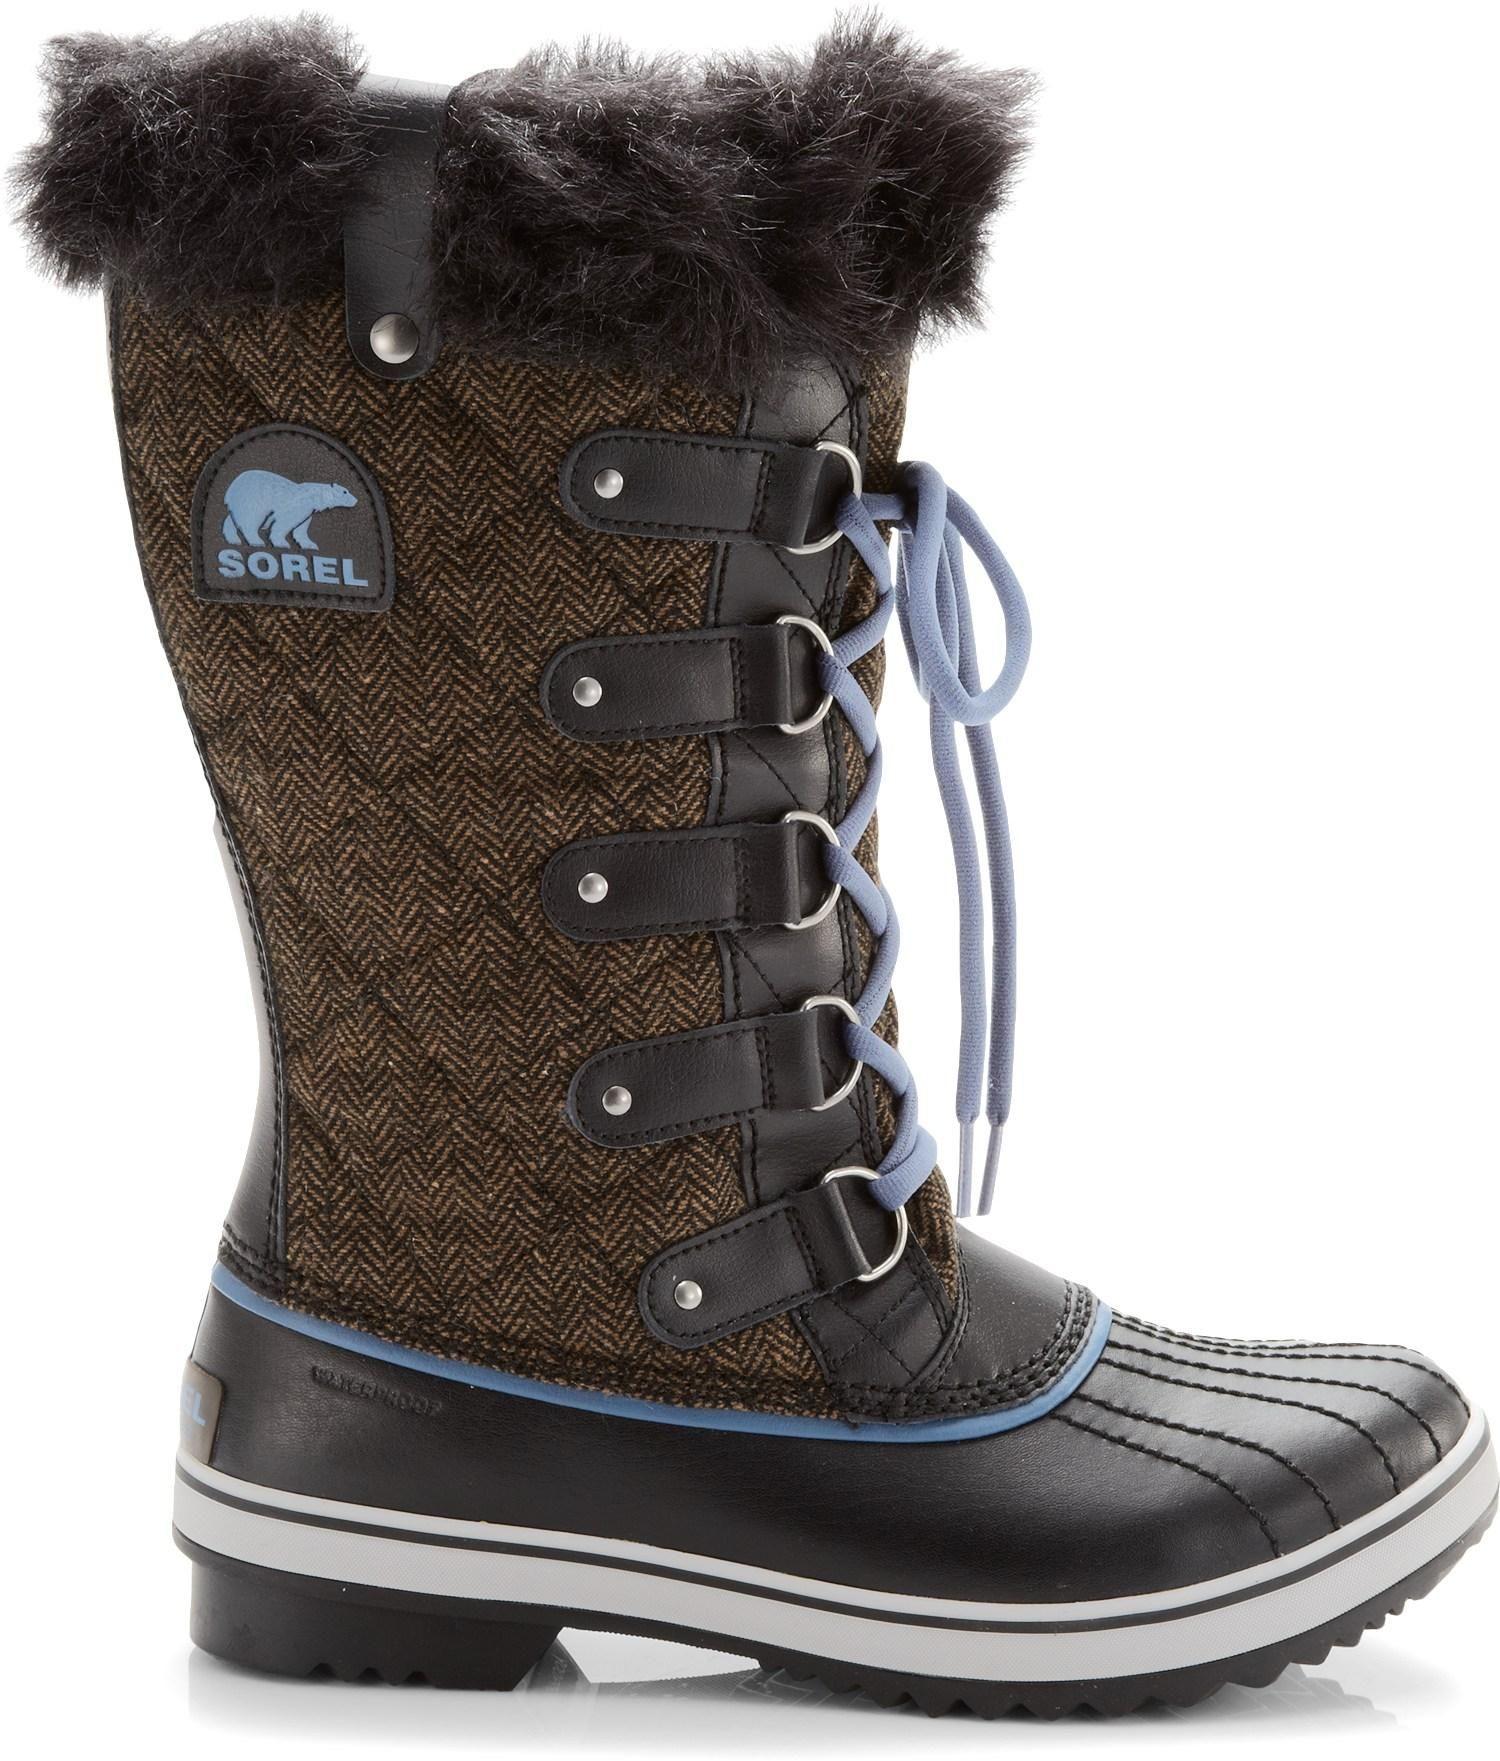 Sorel Tofino Herringbone Winter Boots Women S Rei Co Op Winter Boots Women Winter Boots Boots